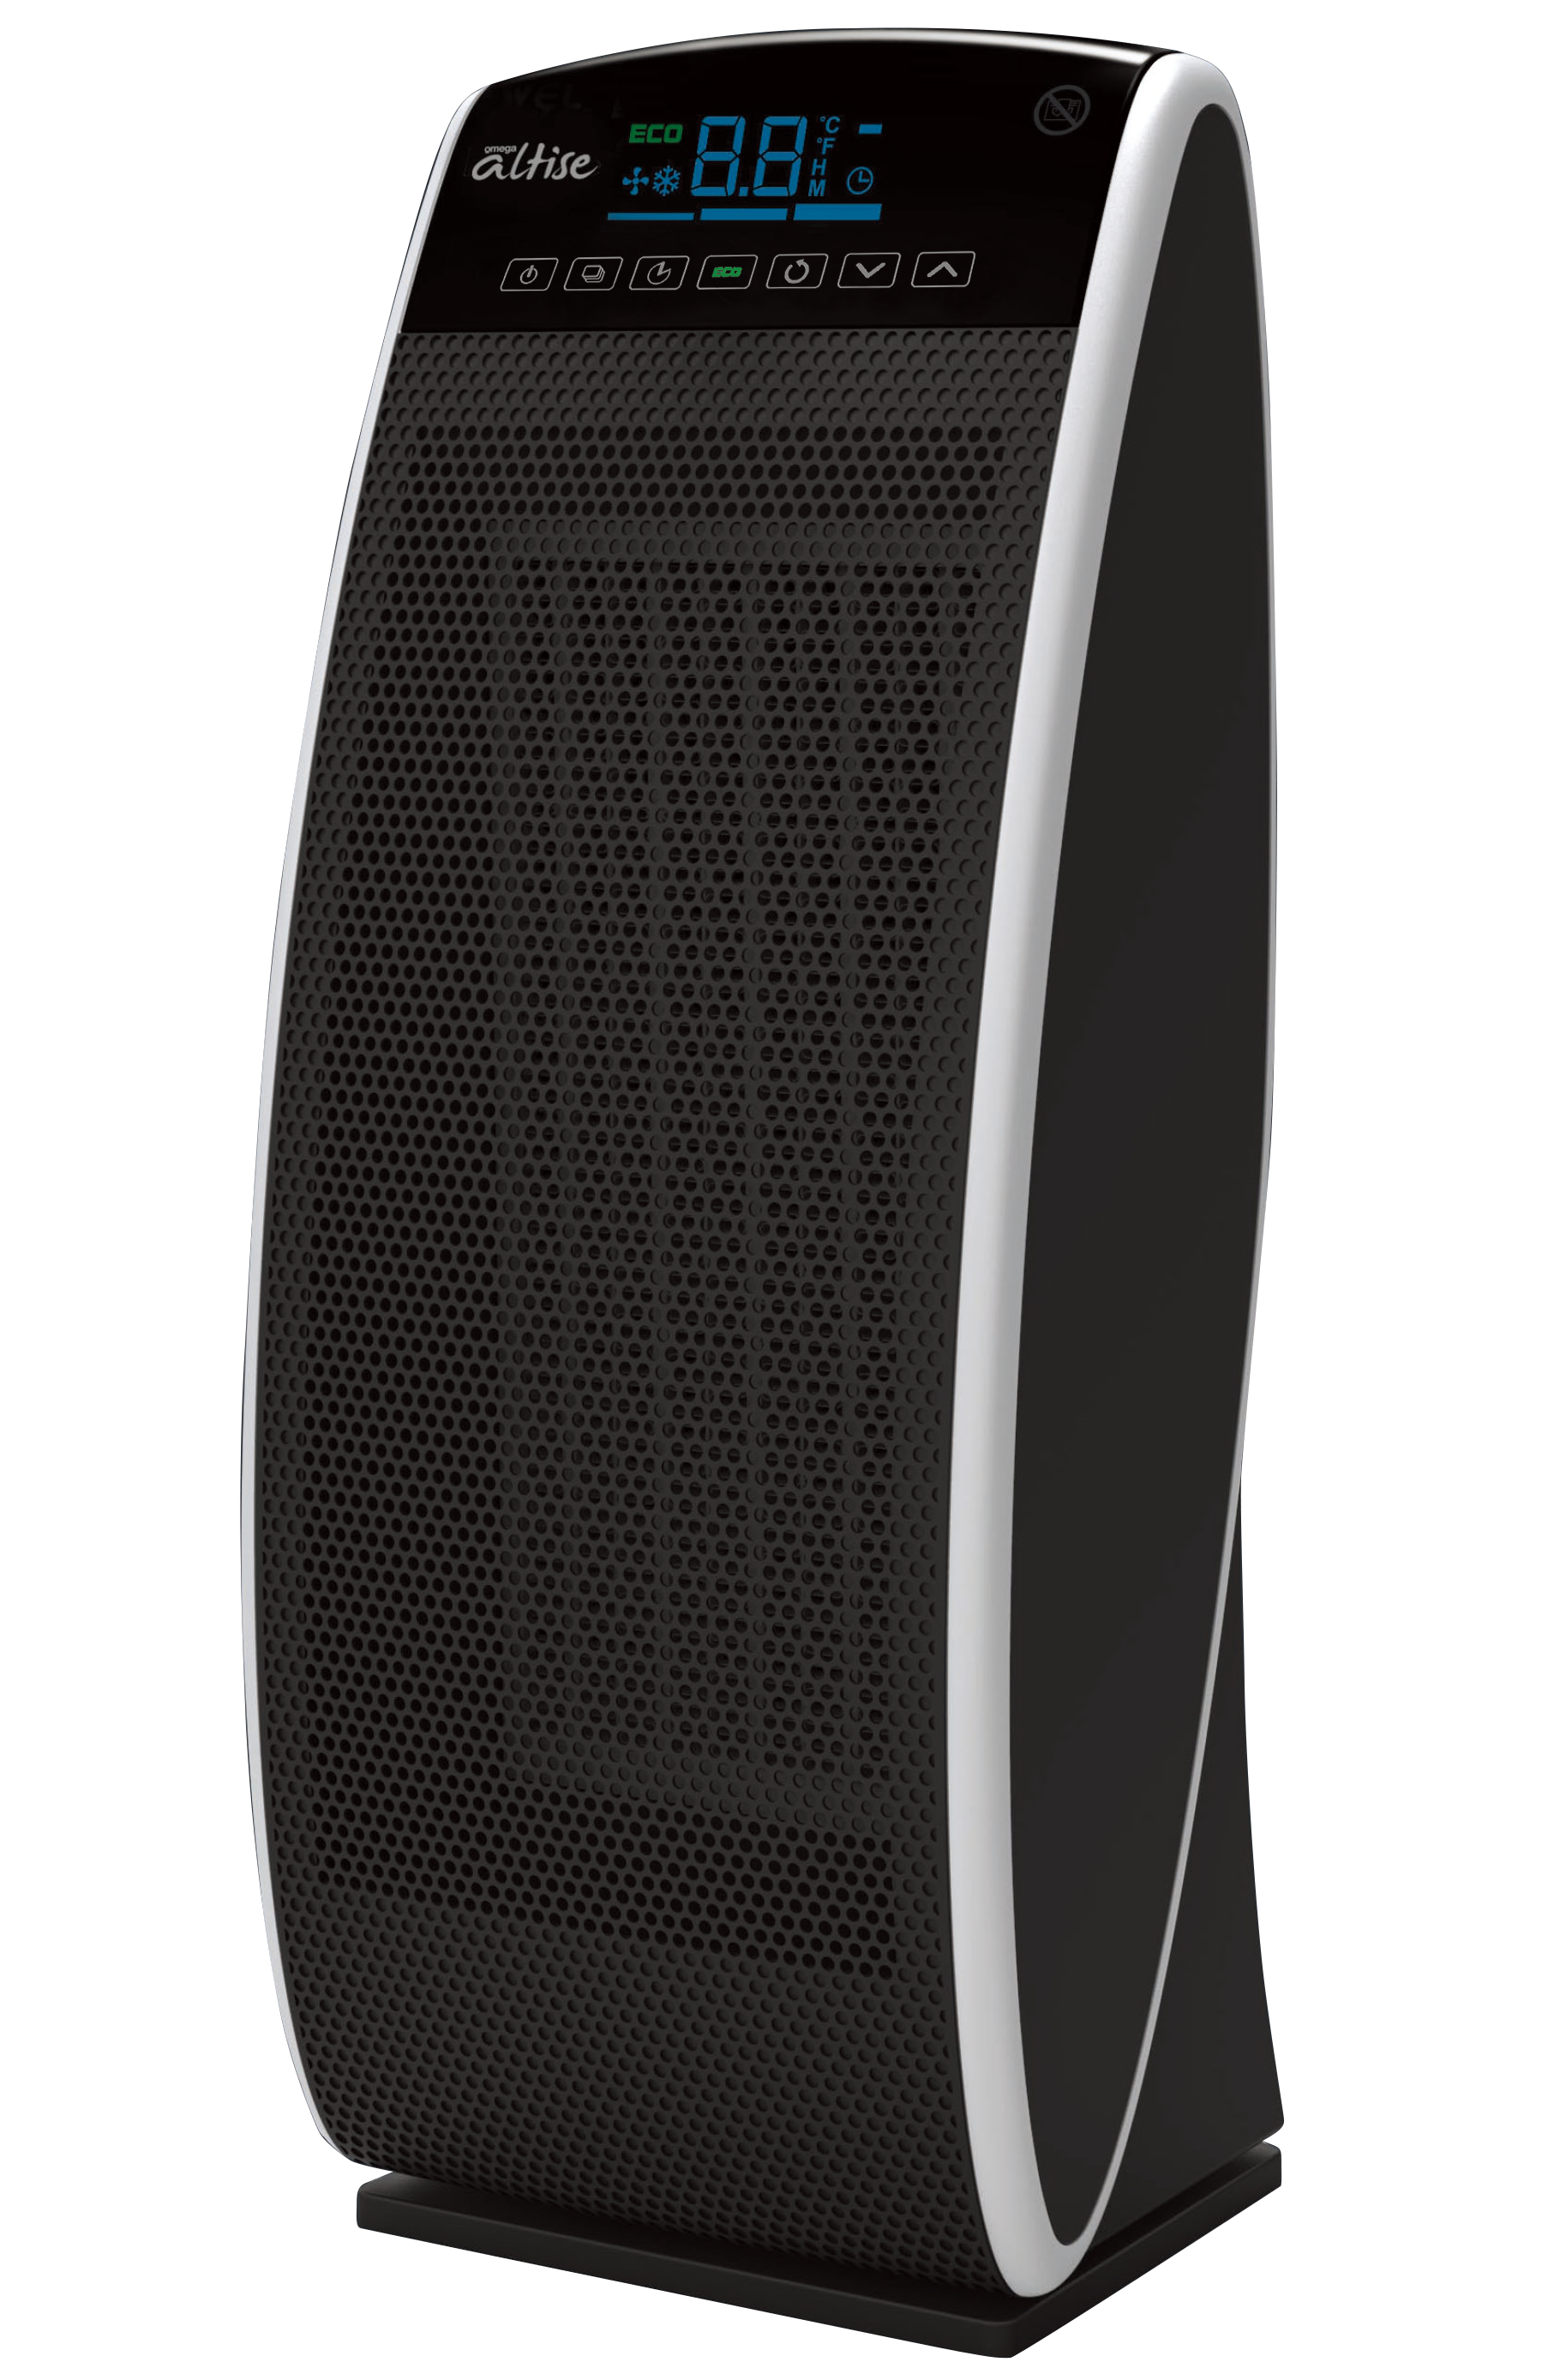 Omega Altise Product Compact Ceramic Heater(AHCC2400TB)